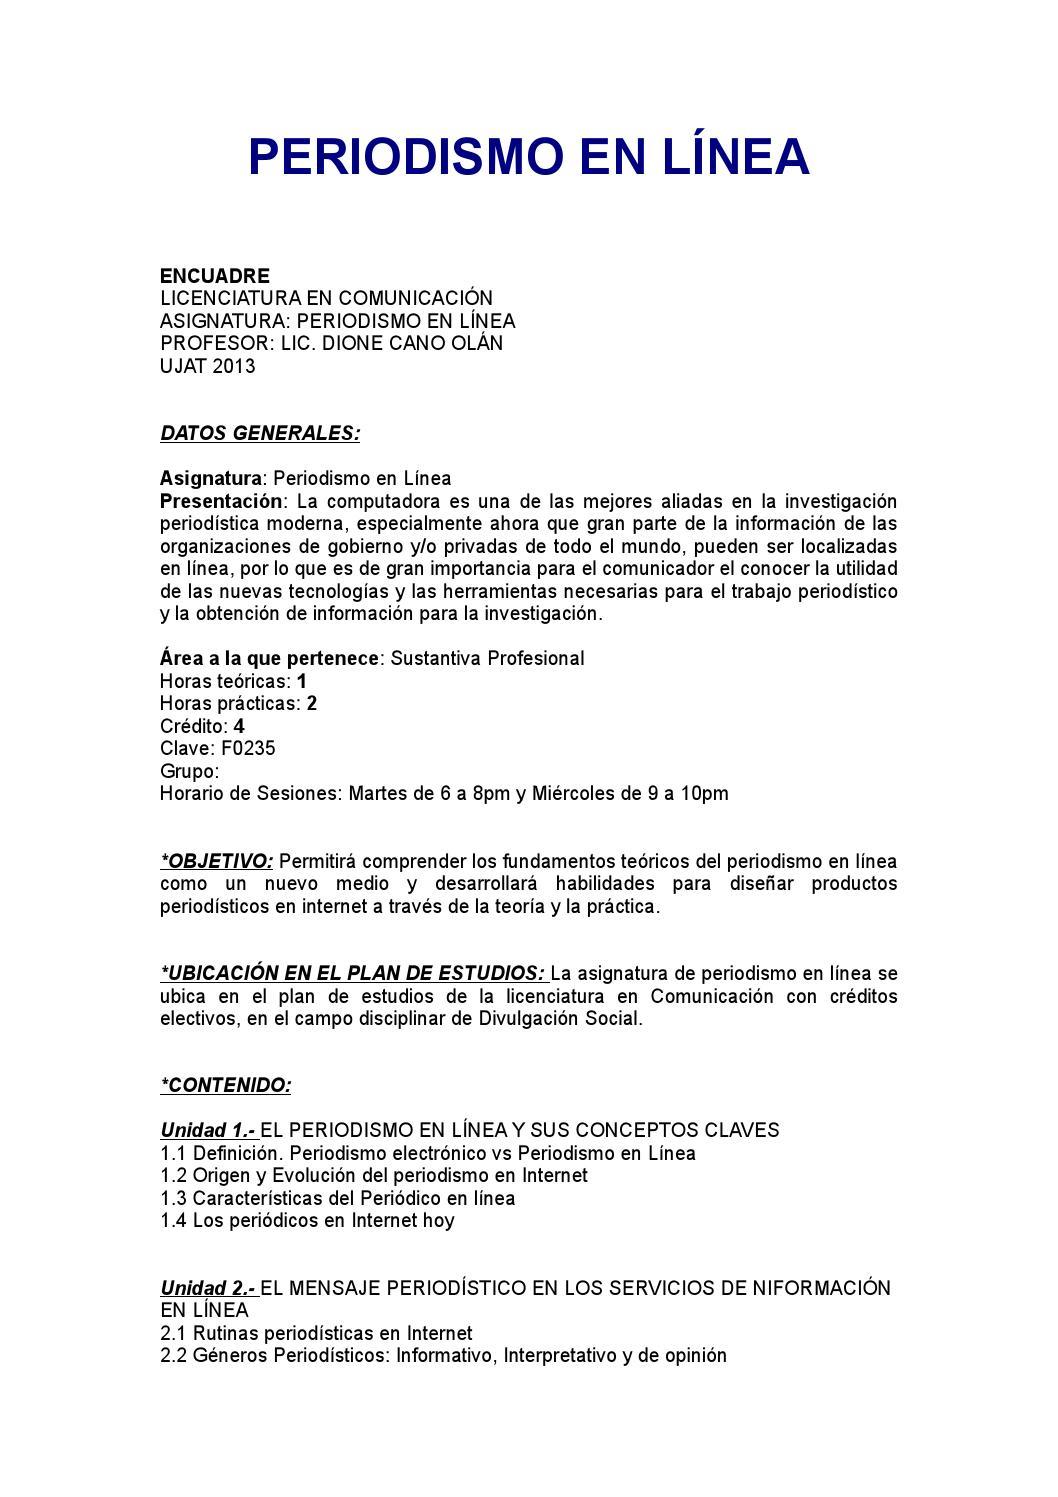 Encuadre peridosimo en linea by Dione Cano - issuu